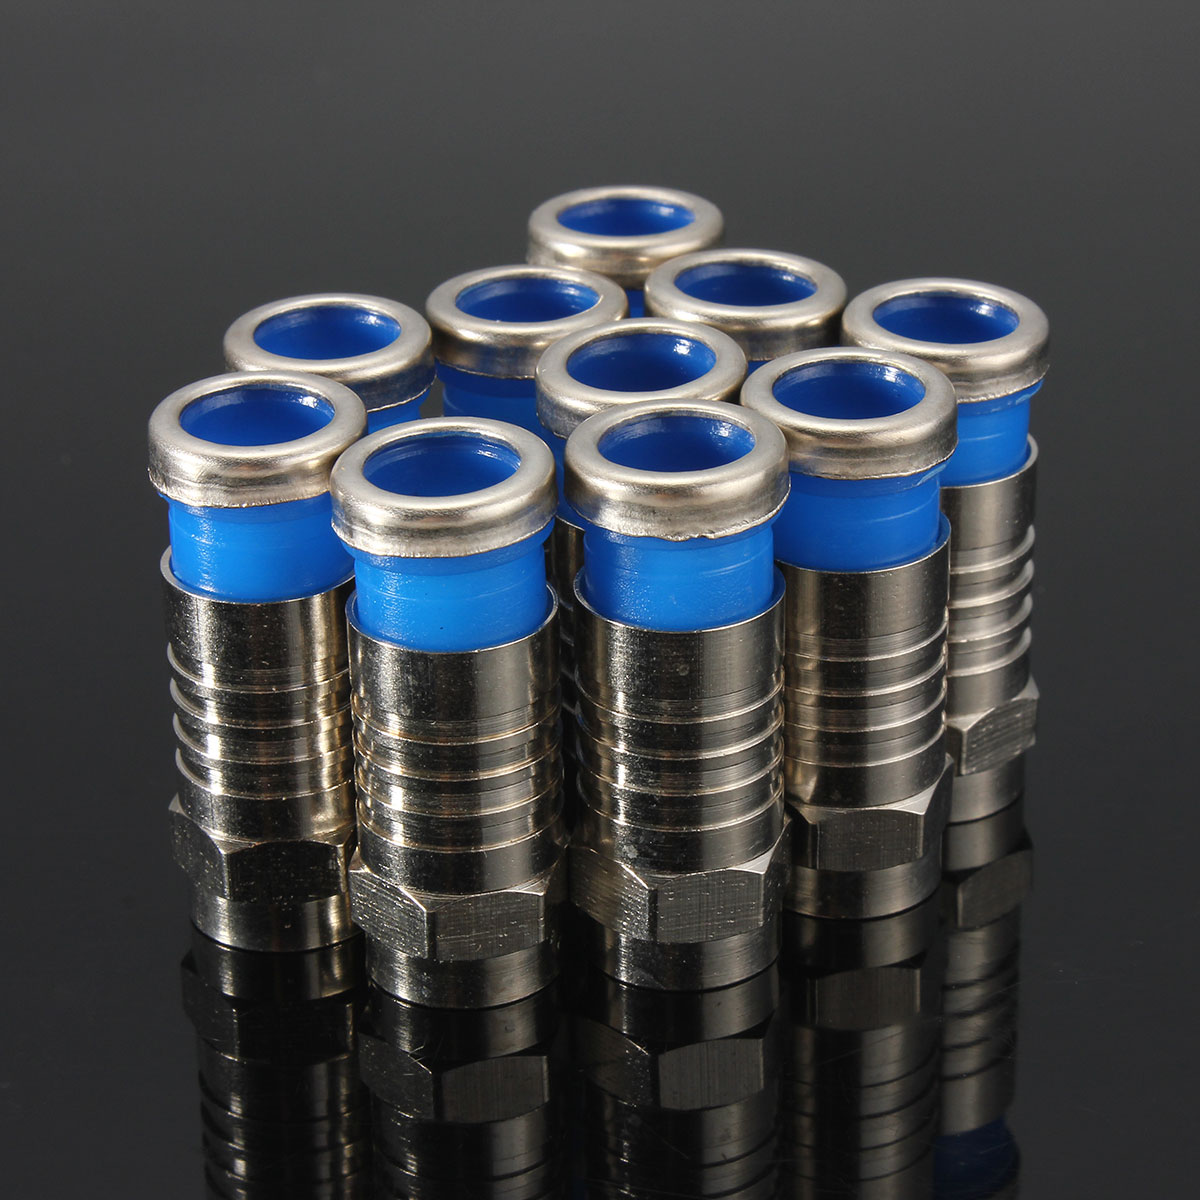 10Pcs F Male Plug Connectors Compression for RG59 Coaxial Cable RG6